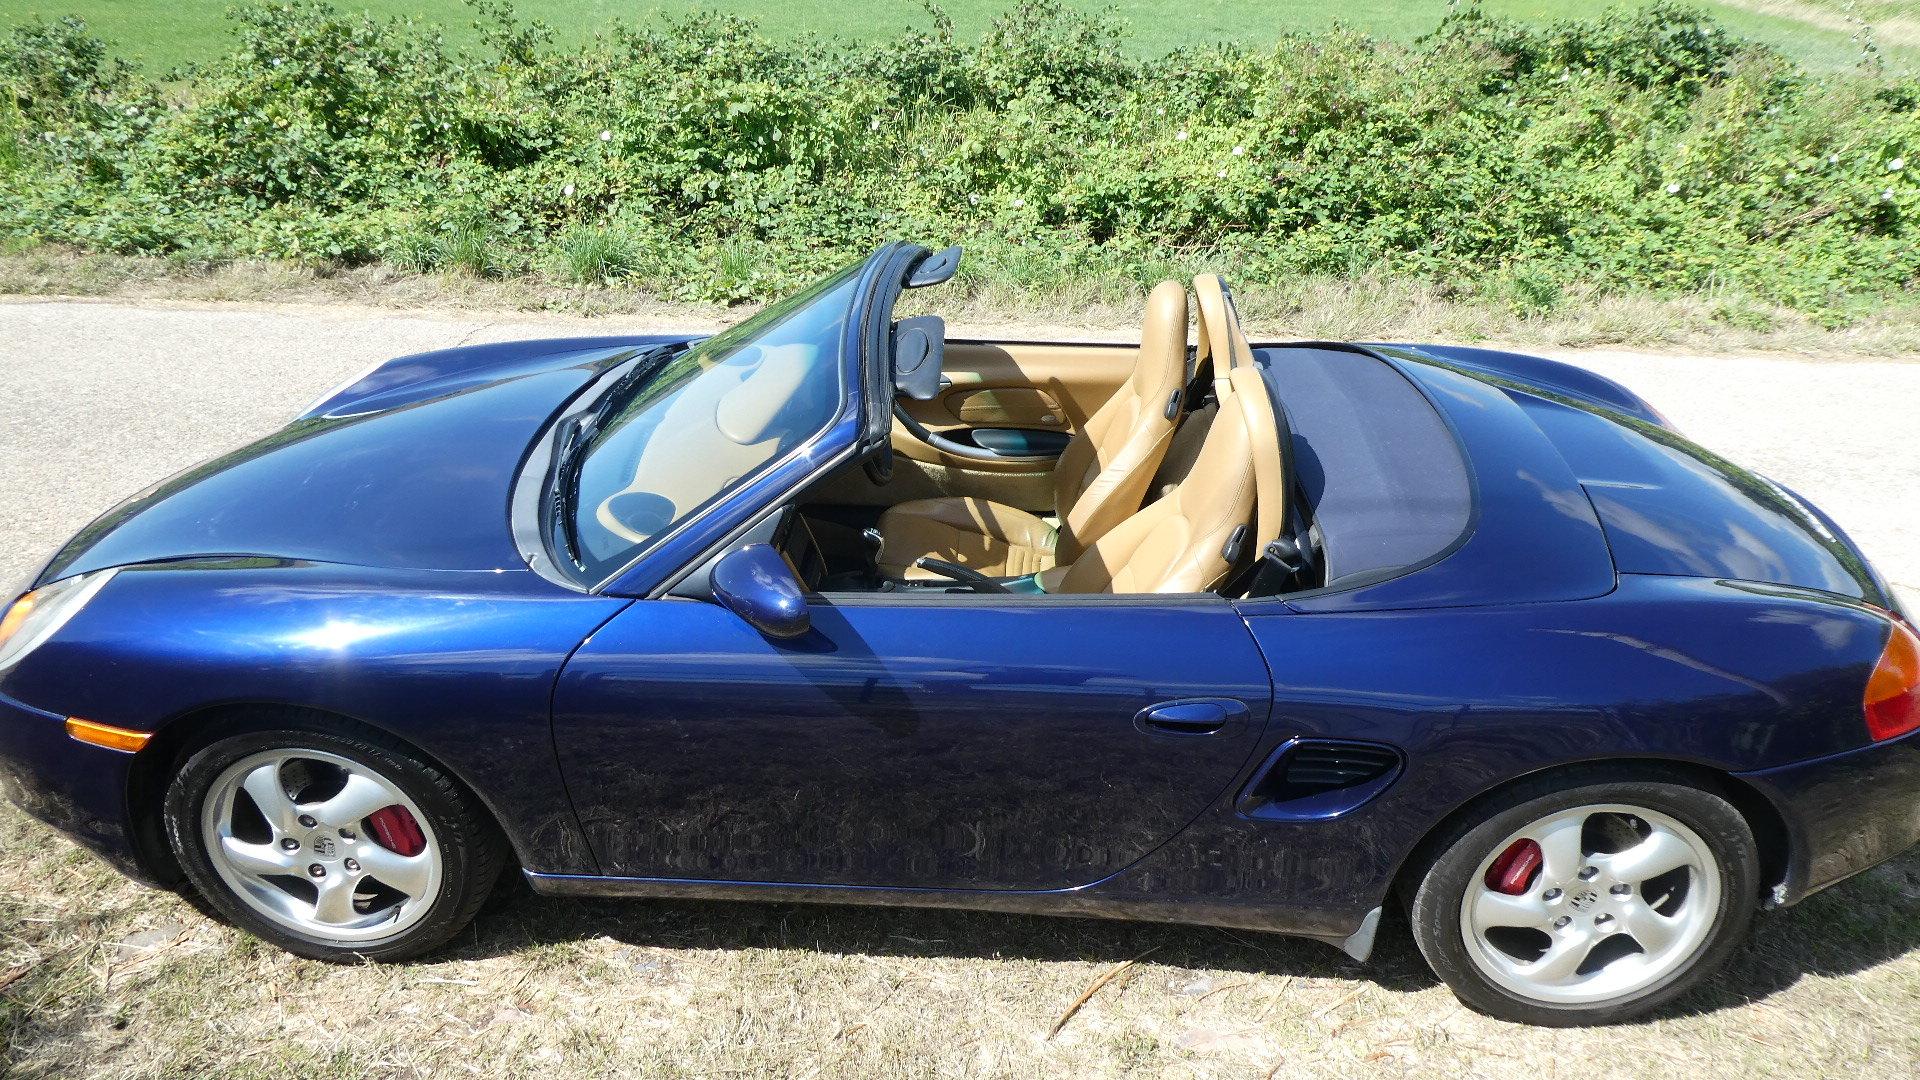 2001 Porsche Boxster S  3.2 litre Convertible  SOLD (picture 3 of 6)